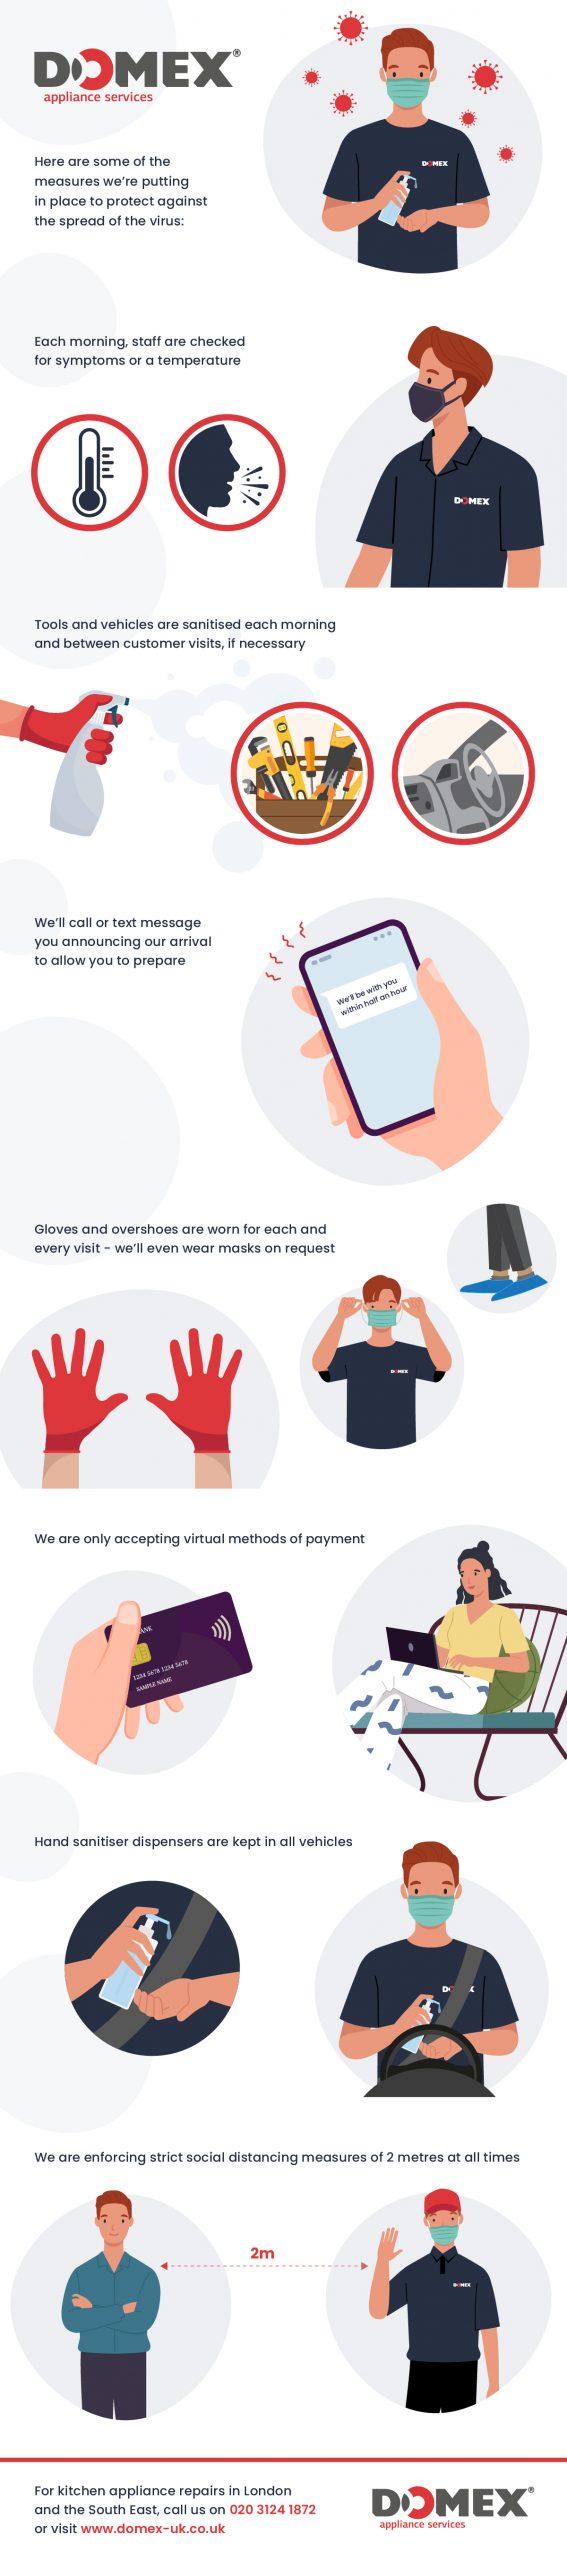 Domex Covid-19 Response Infographic